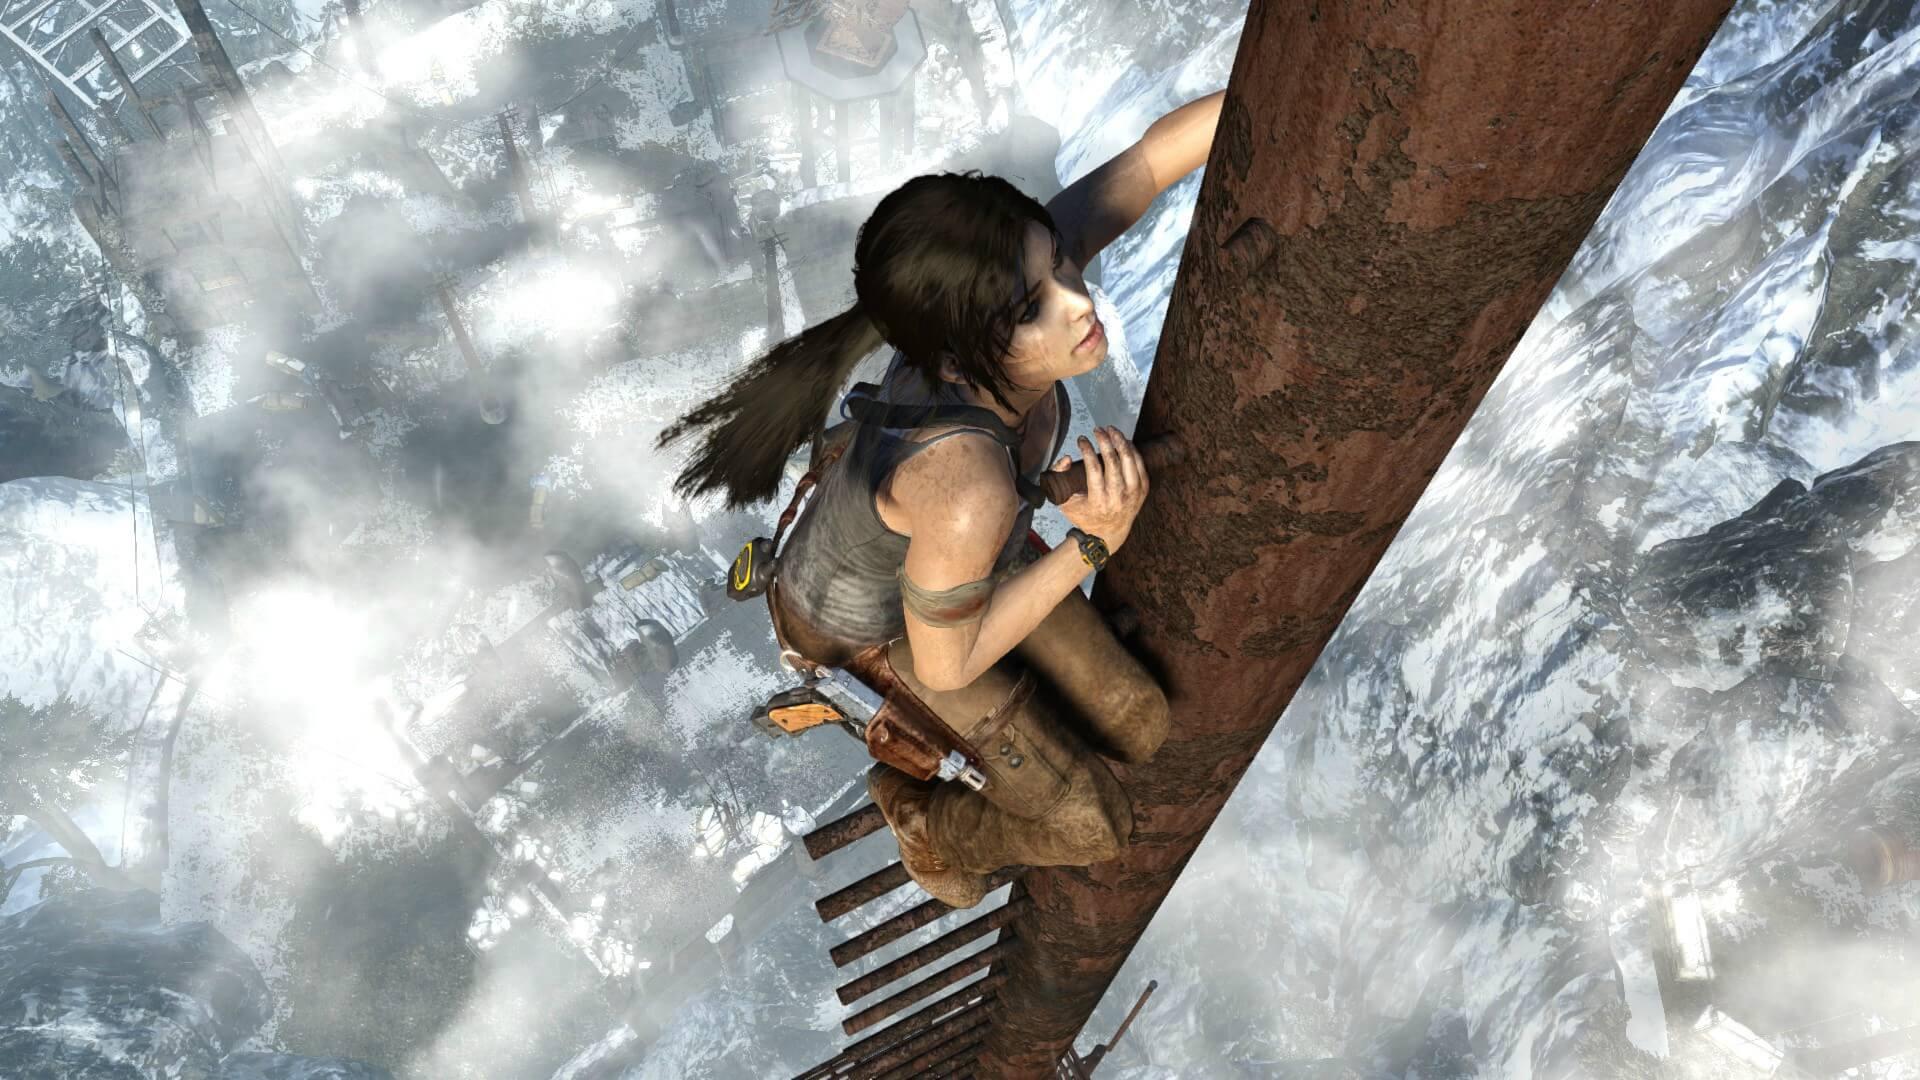 webgl-skybox-tomb-raider